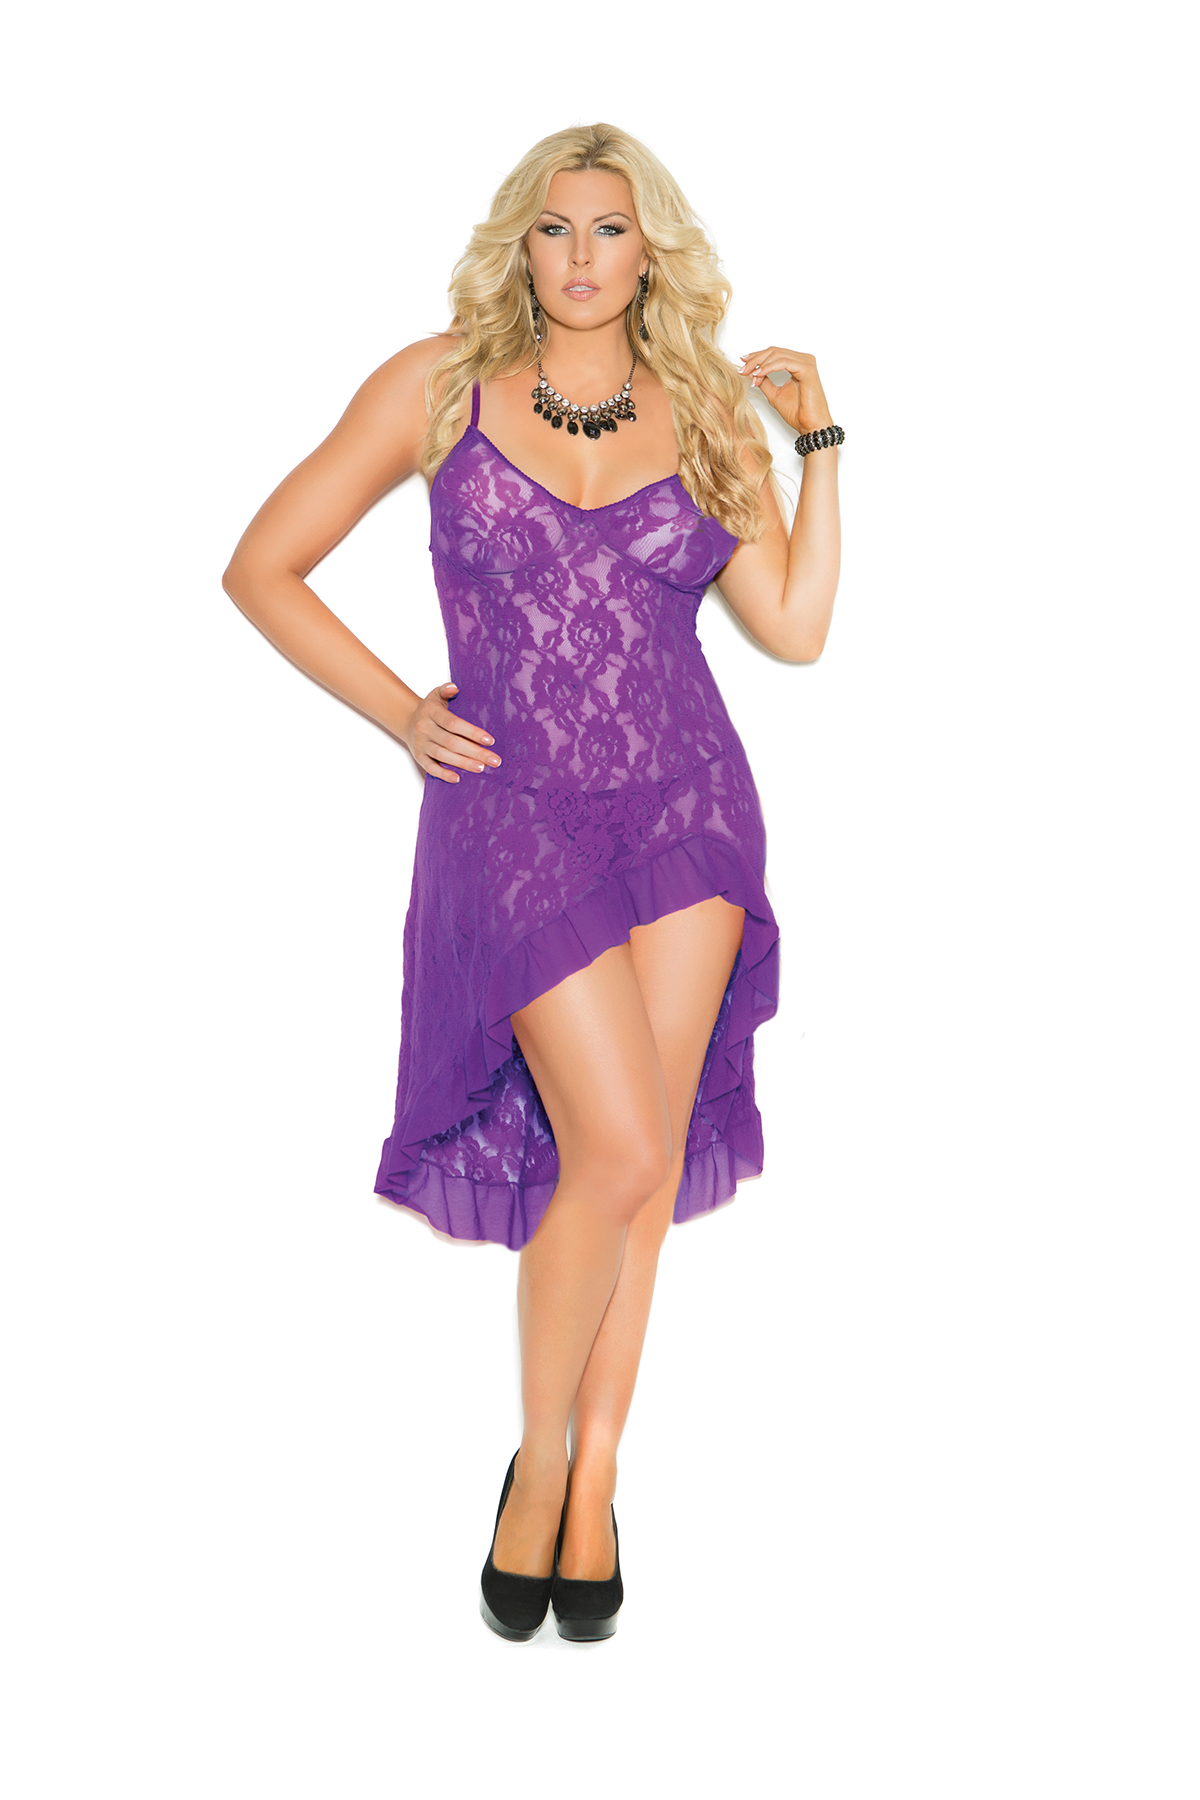 Lace Passions Dress X